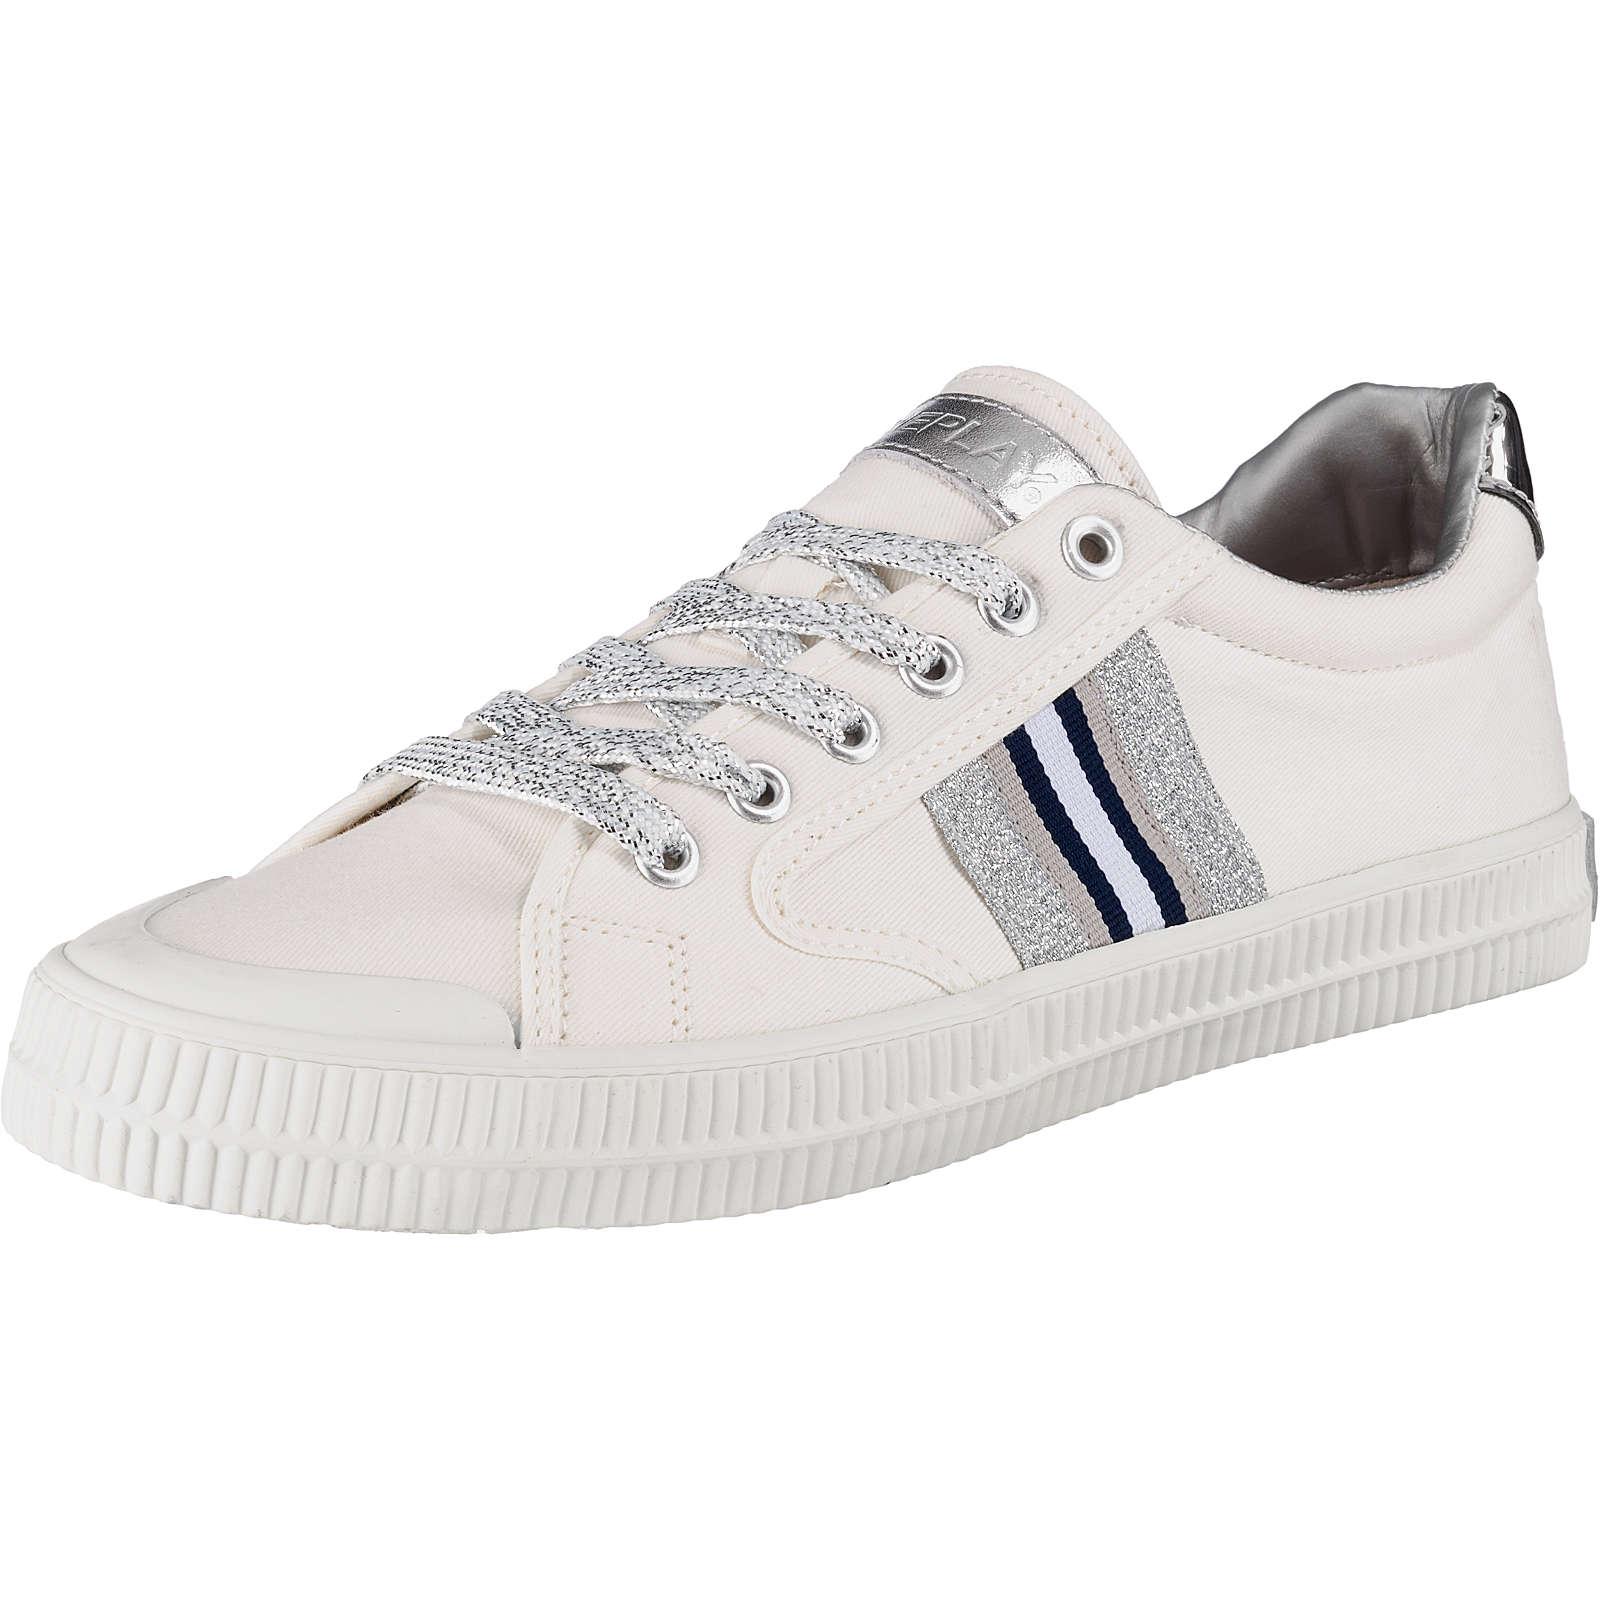 REPLAY EXTRA Sneakers Low weiß Damen Gr. 38